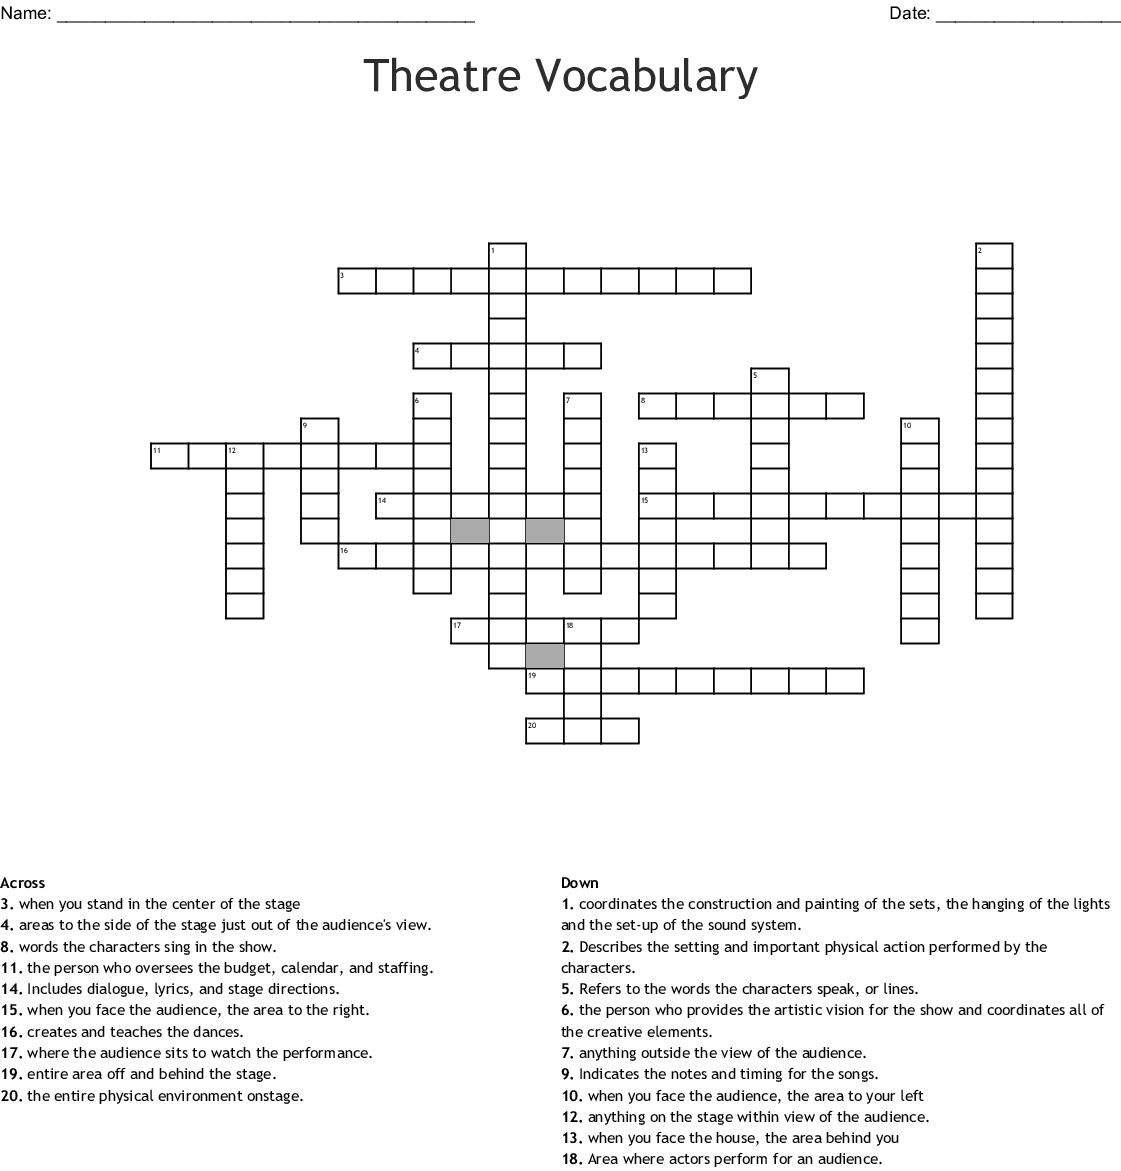 Theatre Vocabulary Crossword - WordMint